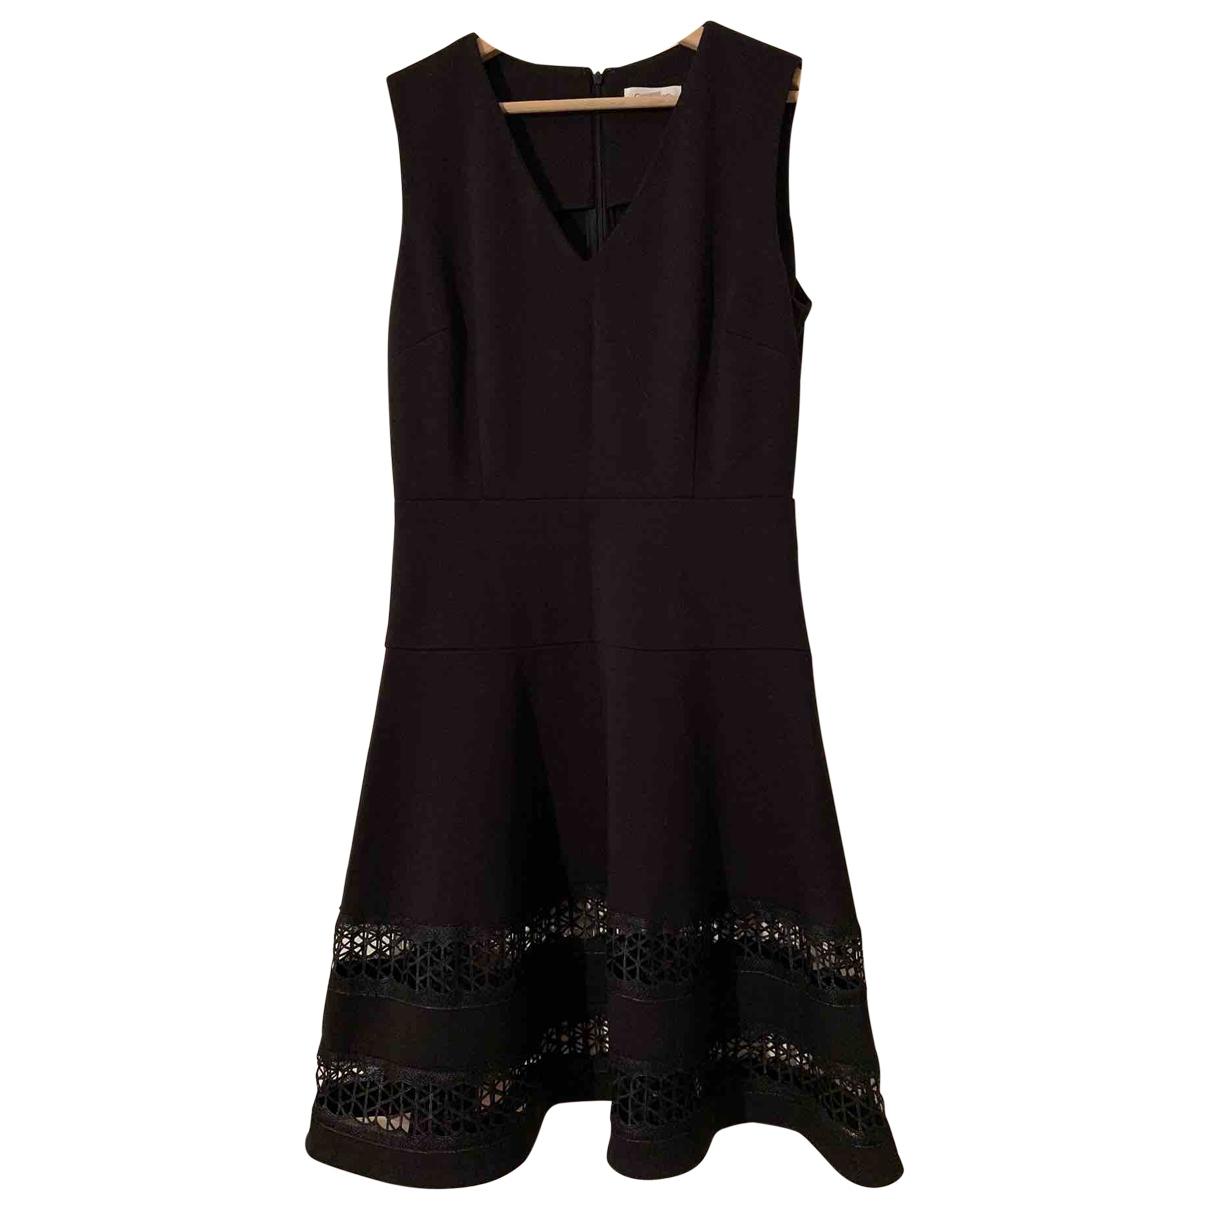 Calvin Klein \N Black Cotton dress for Women 38 FR